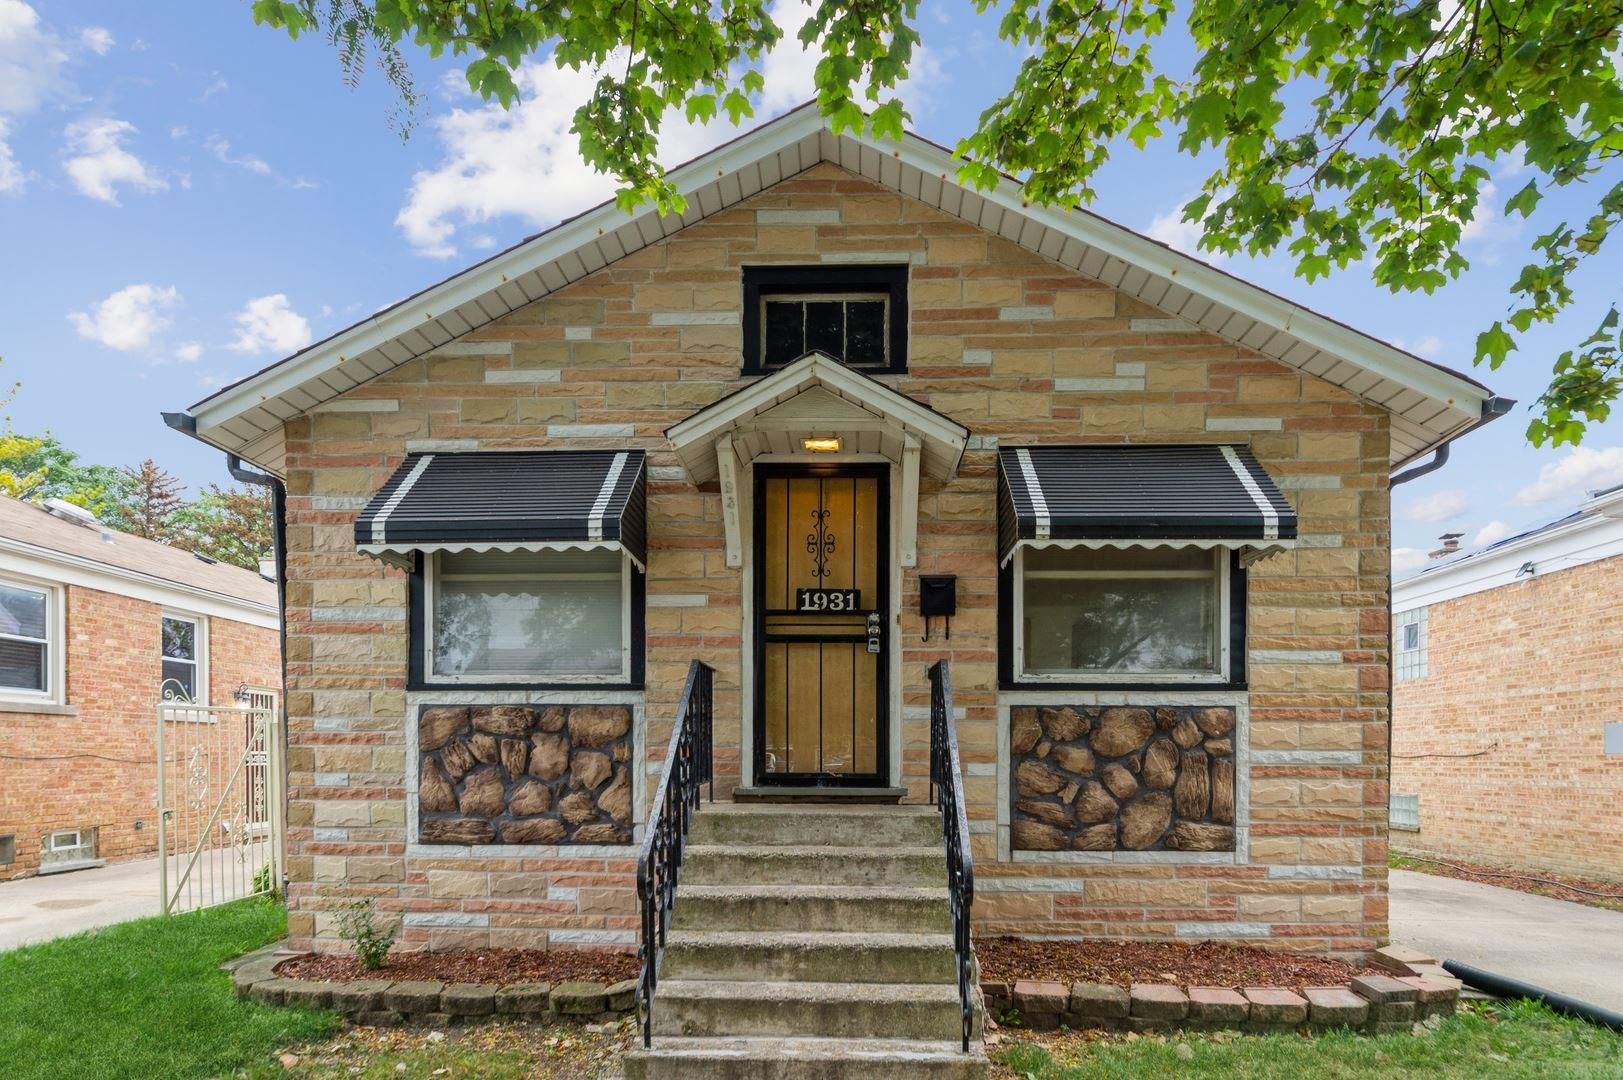 1931 S 20th Avenue, Maywood, IL 60153 - #: 11237256